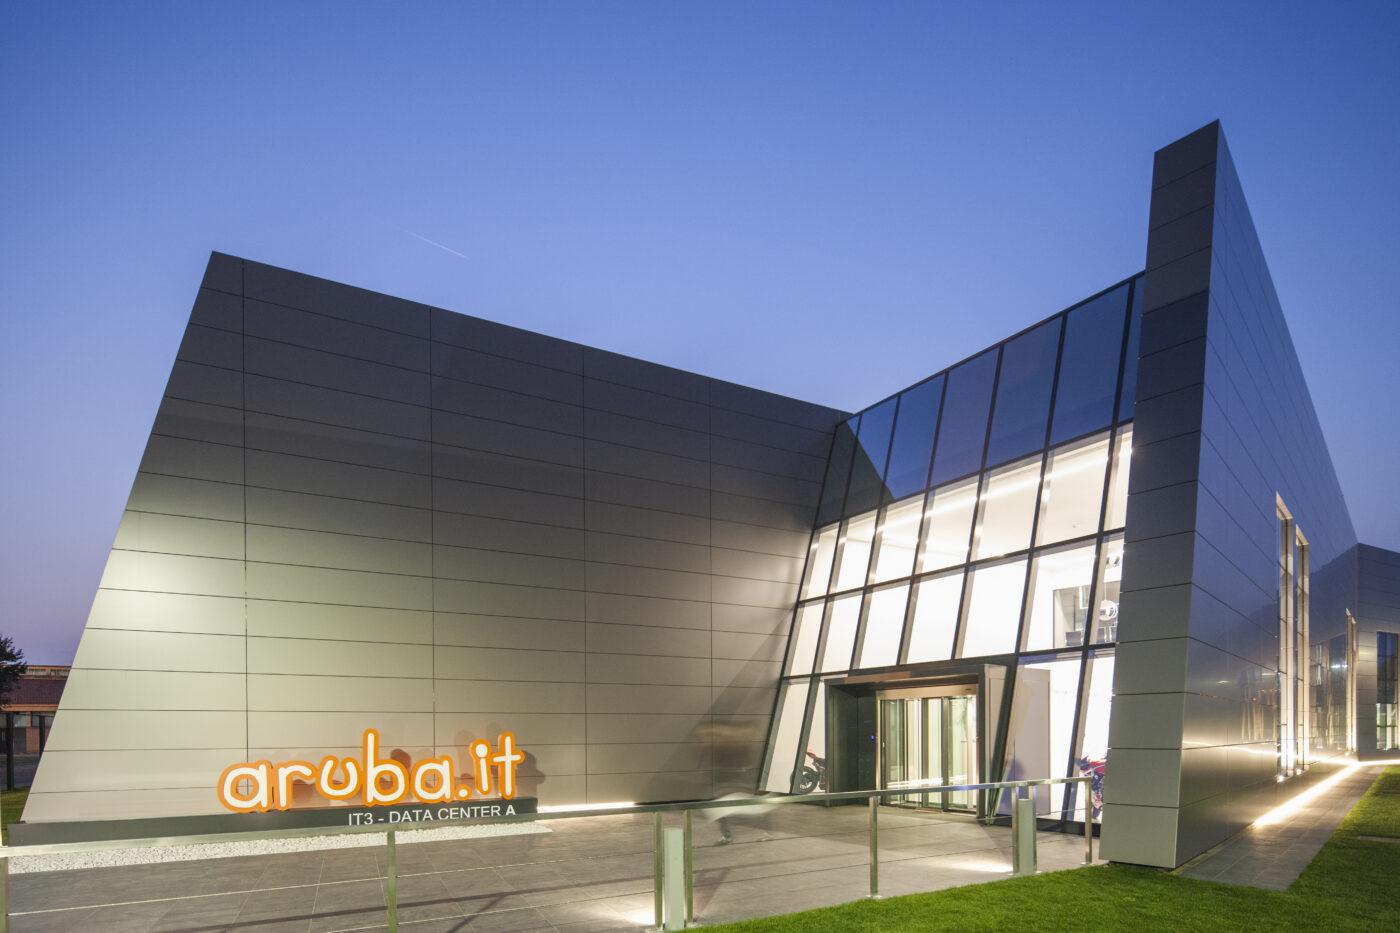 Aruba Enterprise -Global Cloud Data Center di Ponte San Pietro - IT3